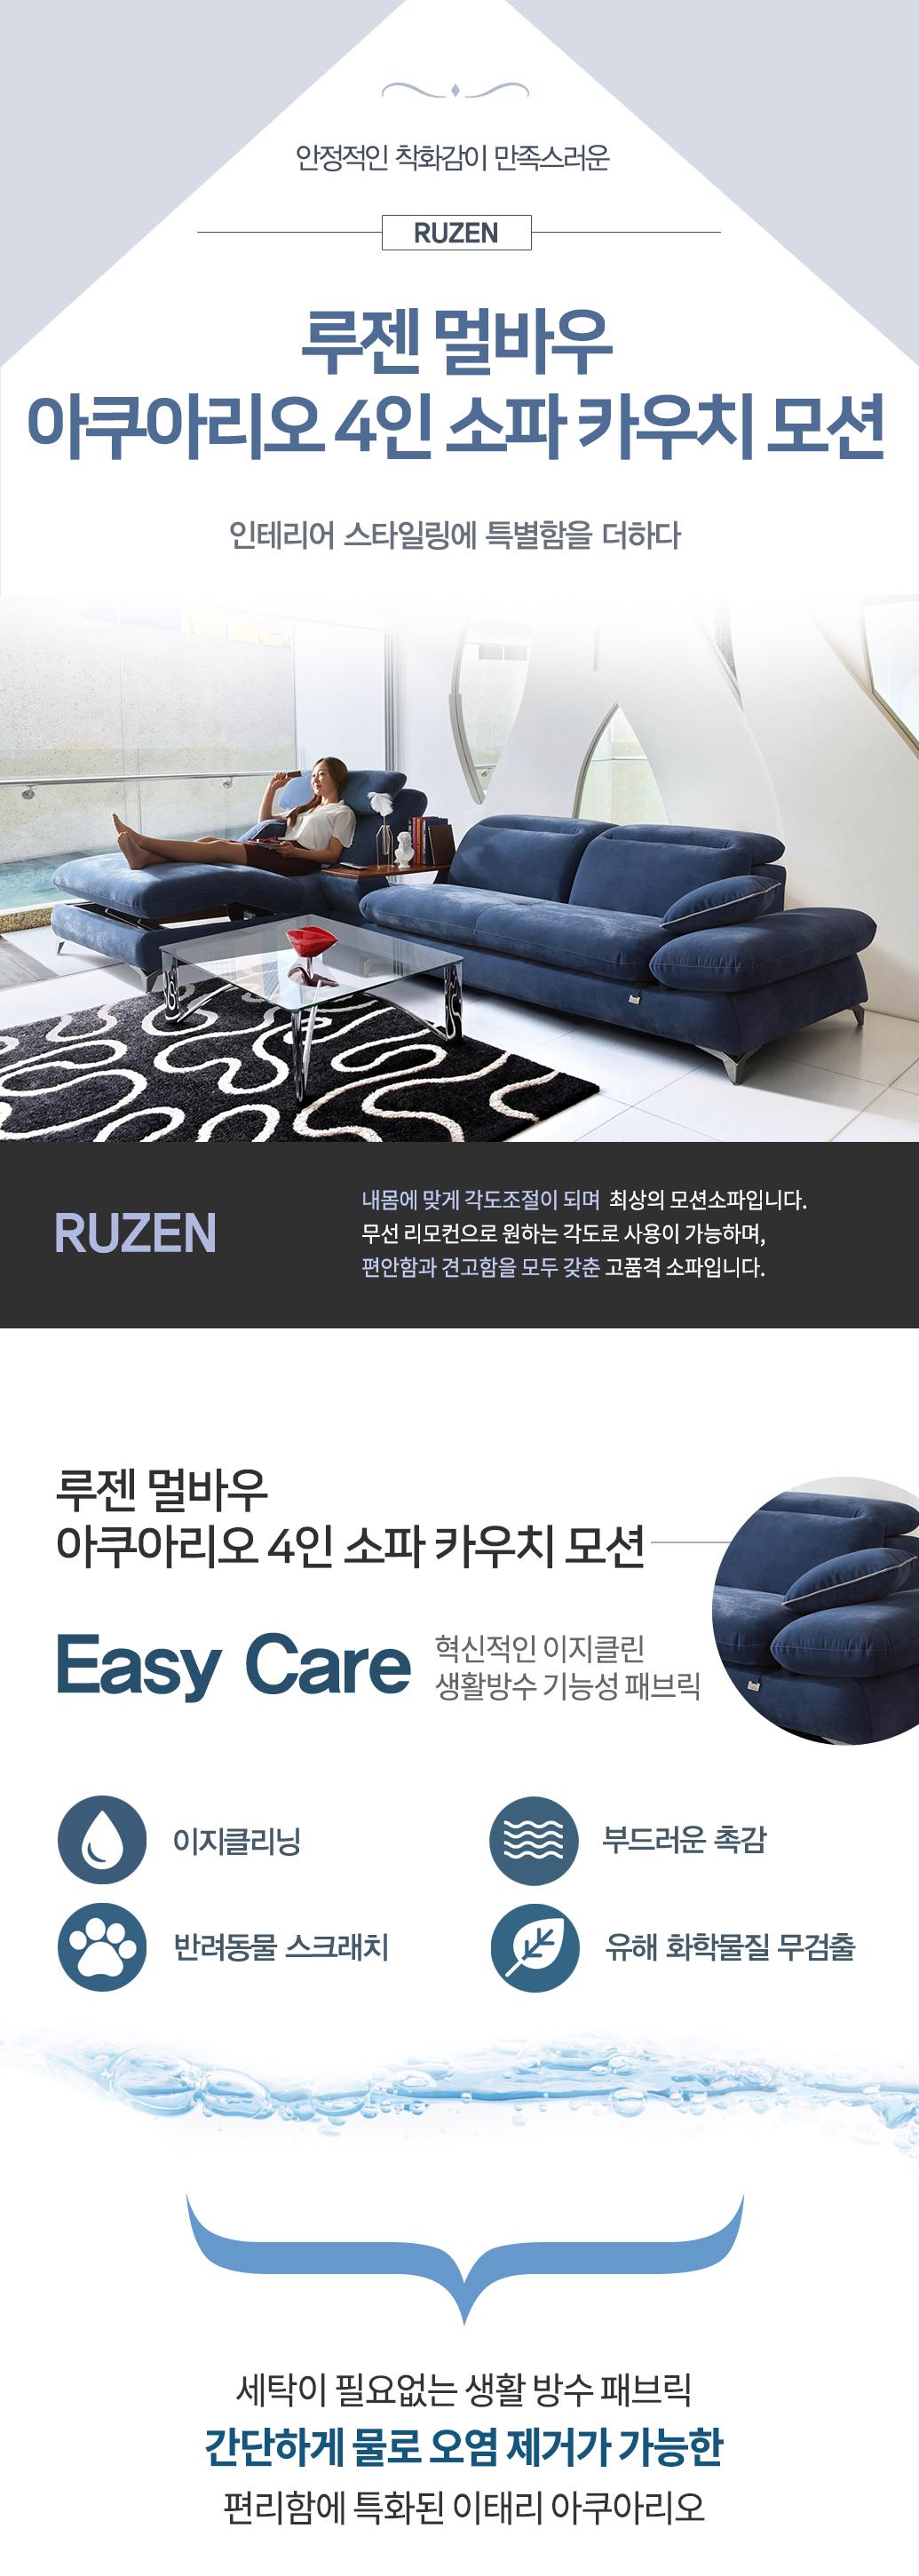 RUZEN_01.jpg